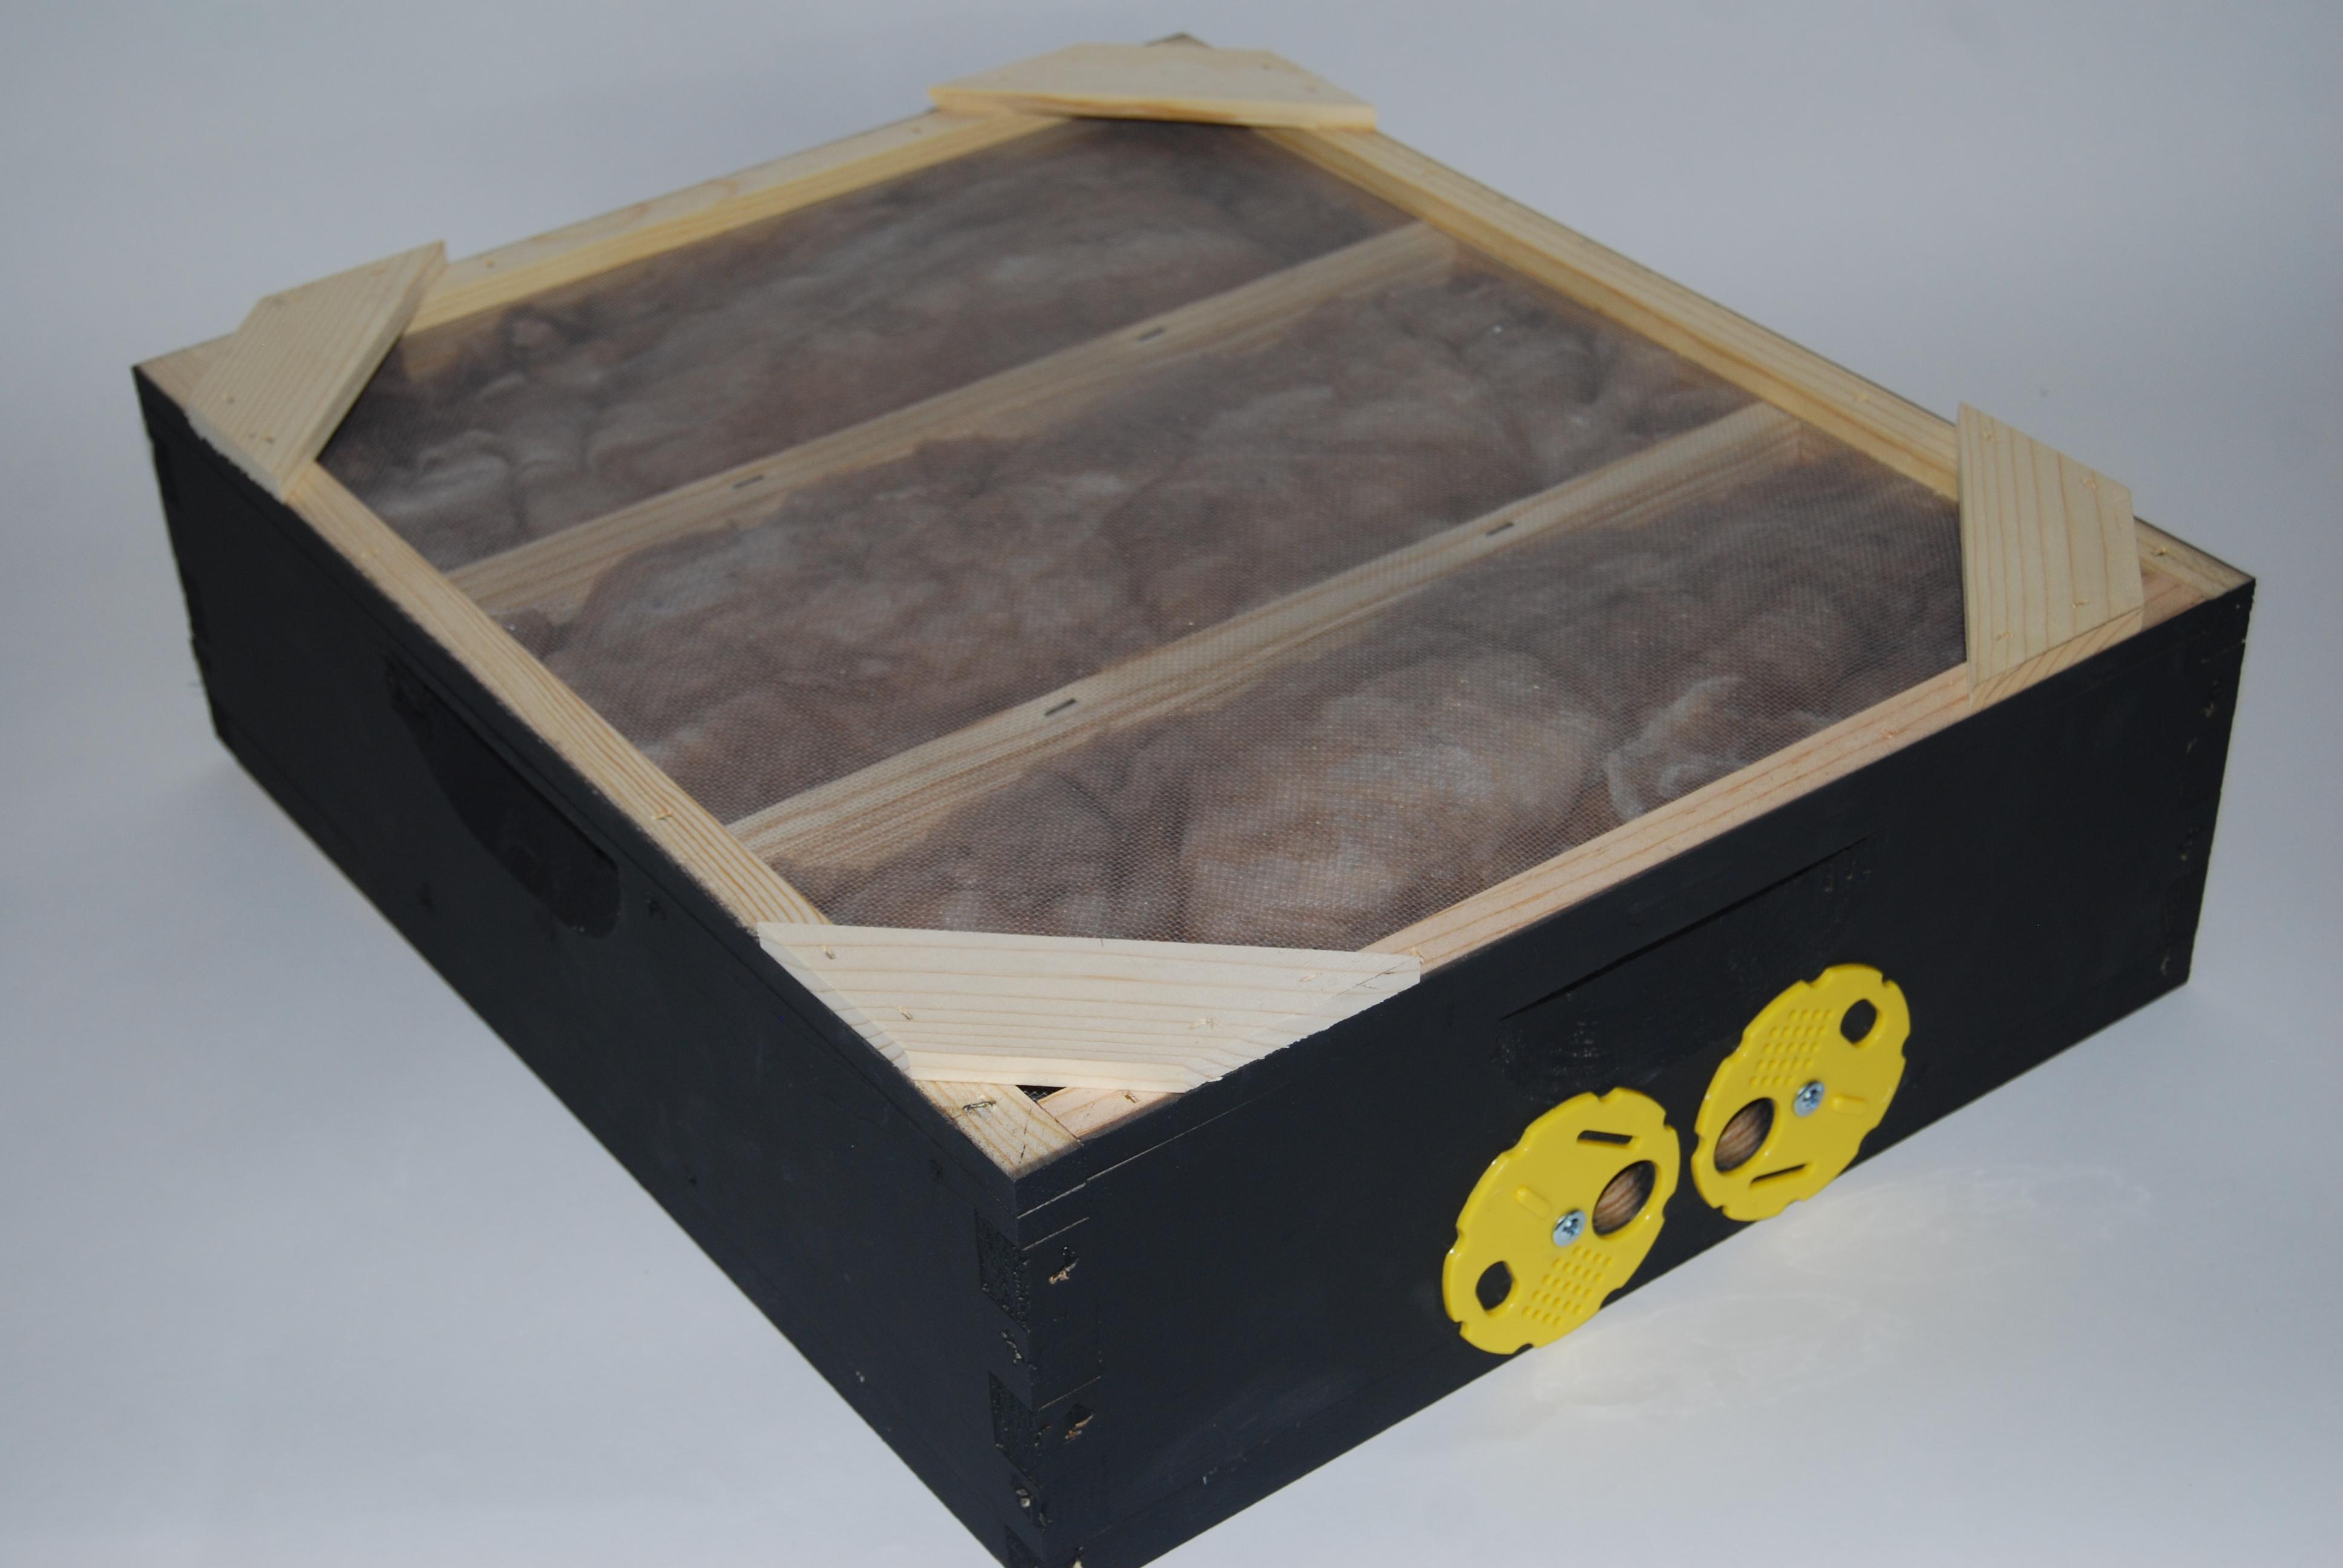 Inside Overwintering Insulation Heater Box